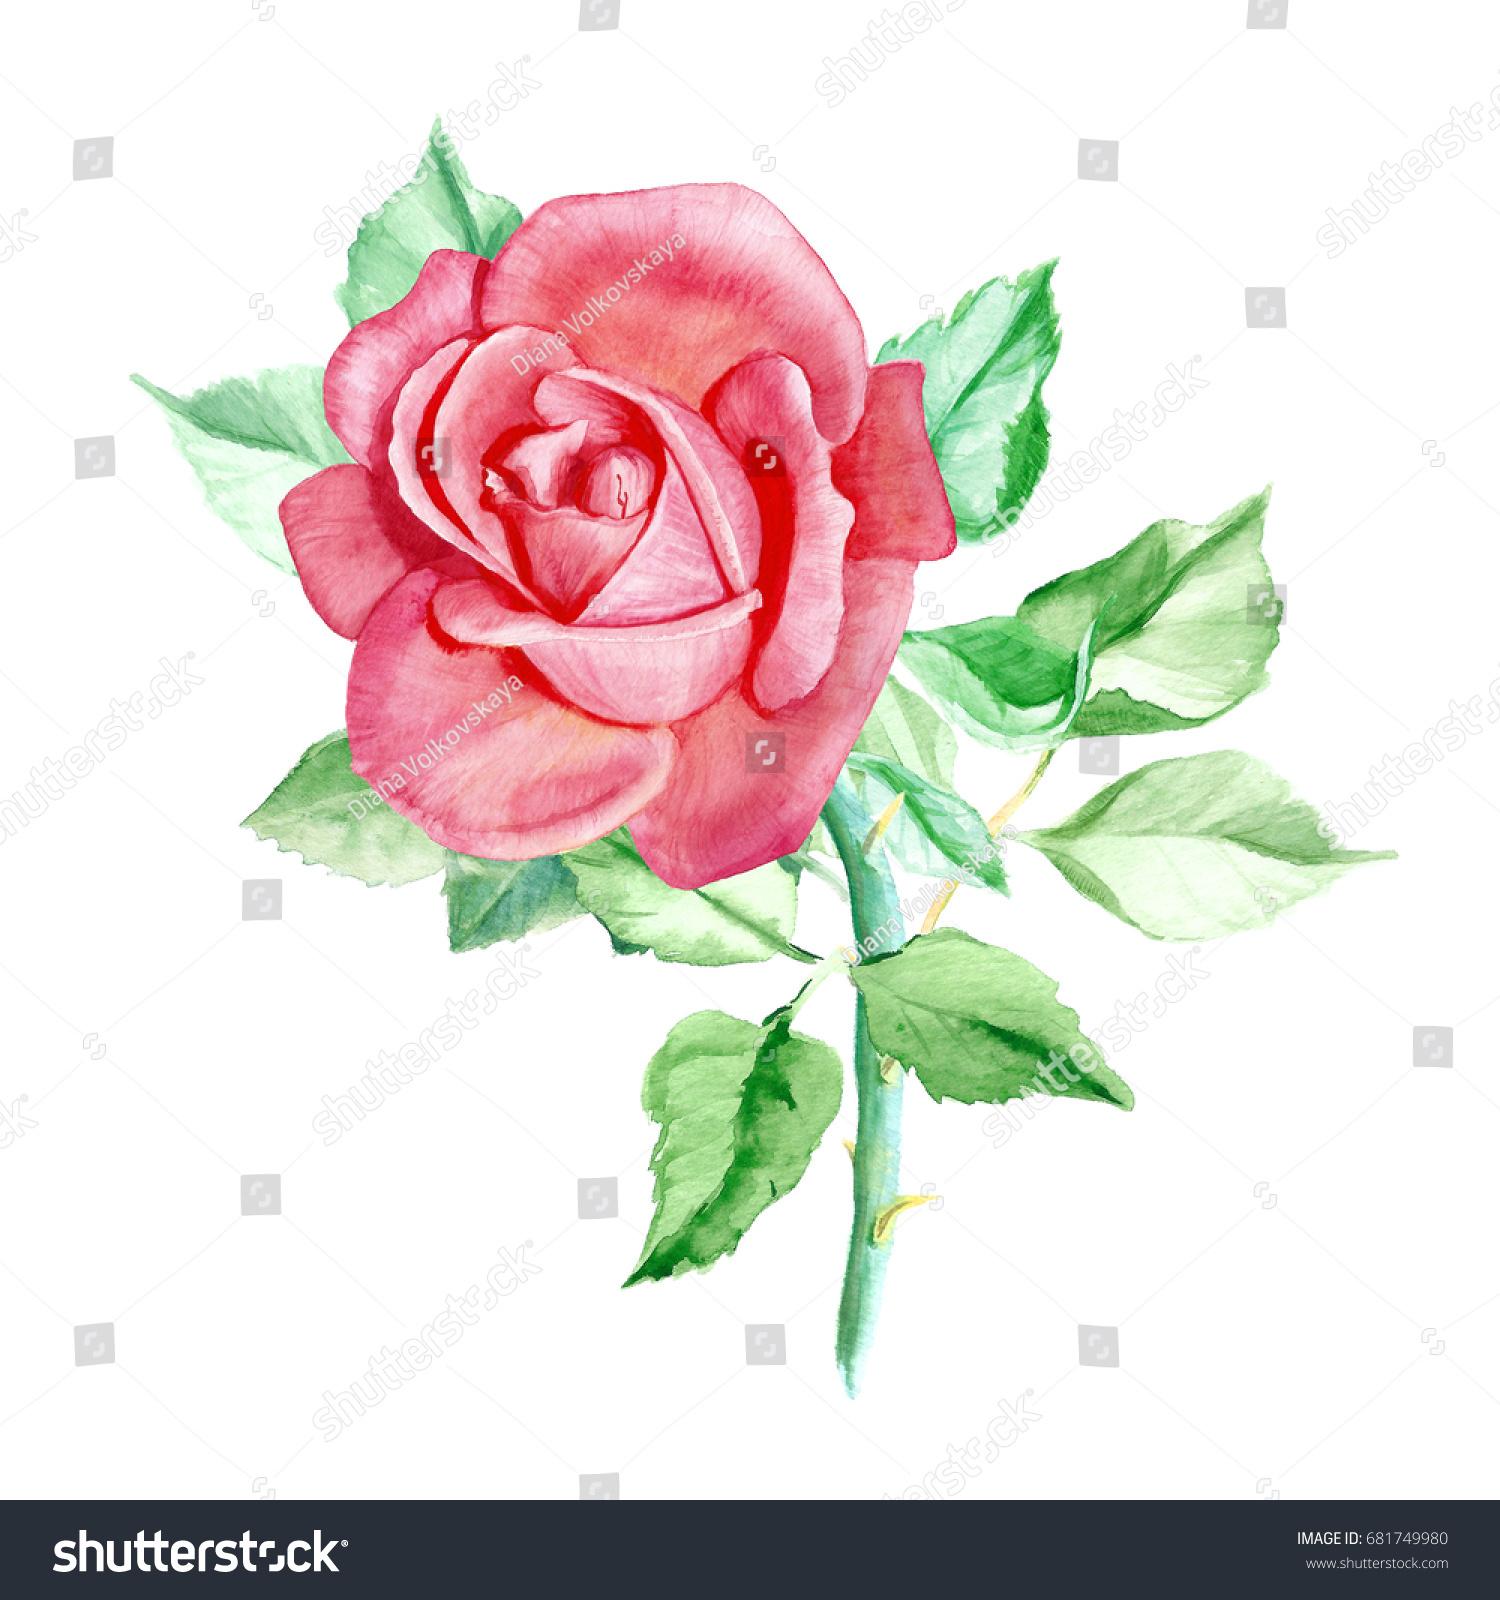 One Pink Rose Watercolor Painting Wedding Drawings Greeting Card